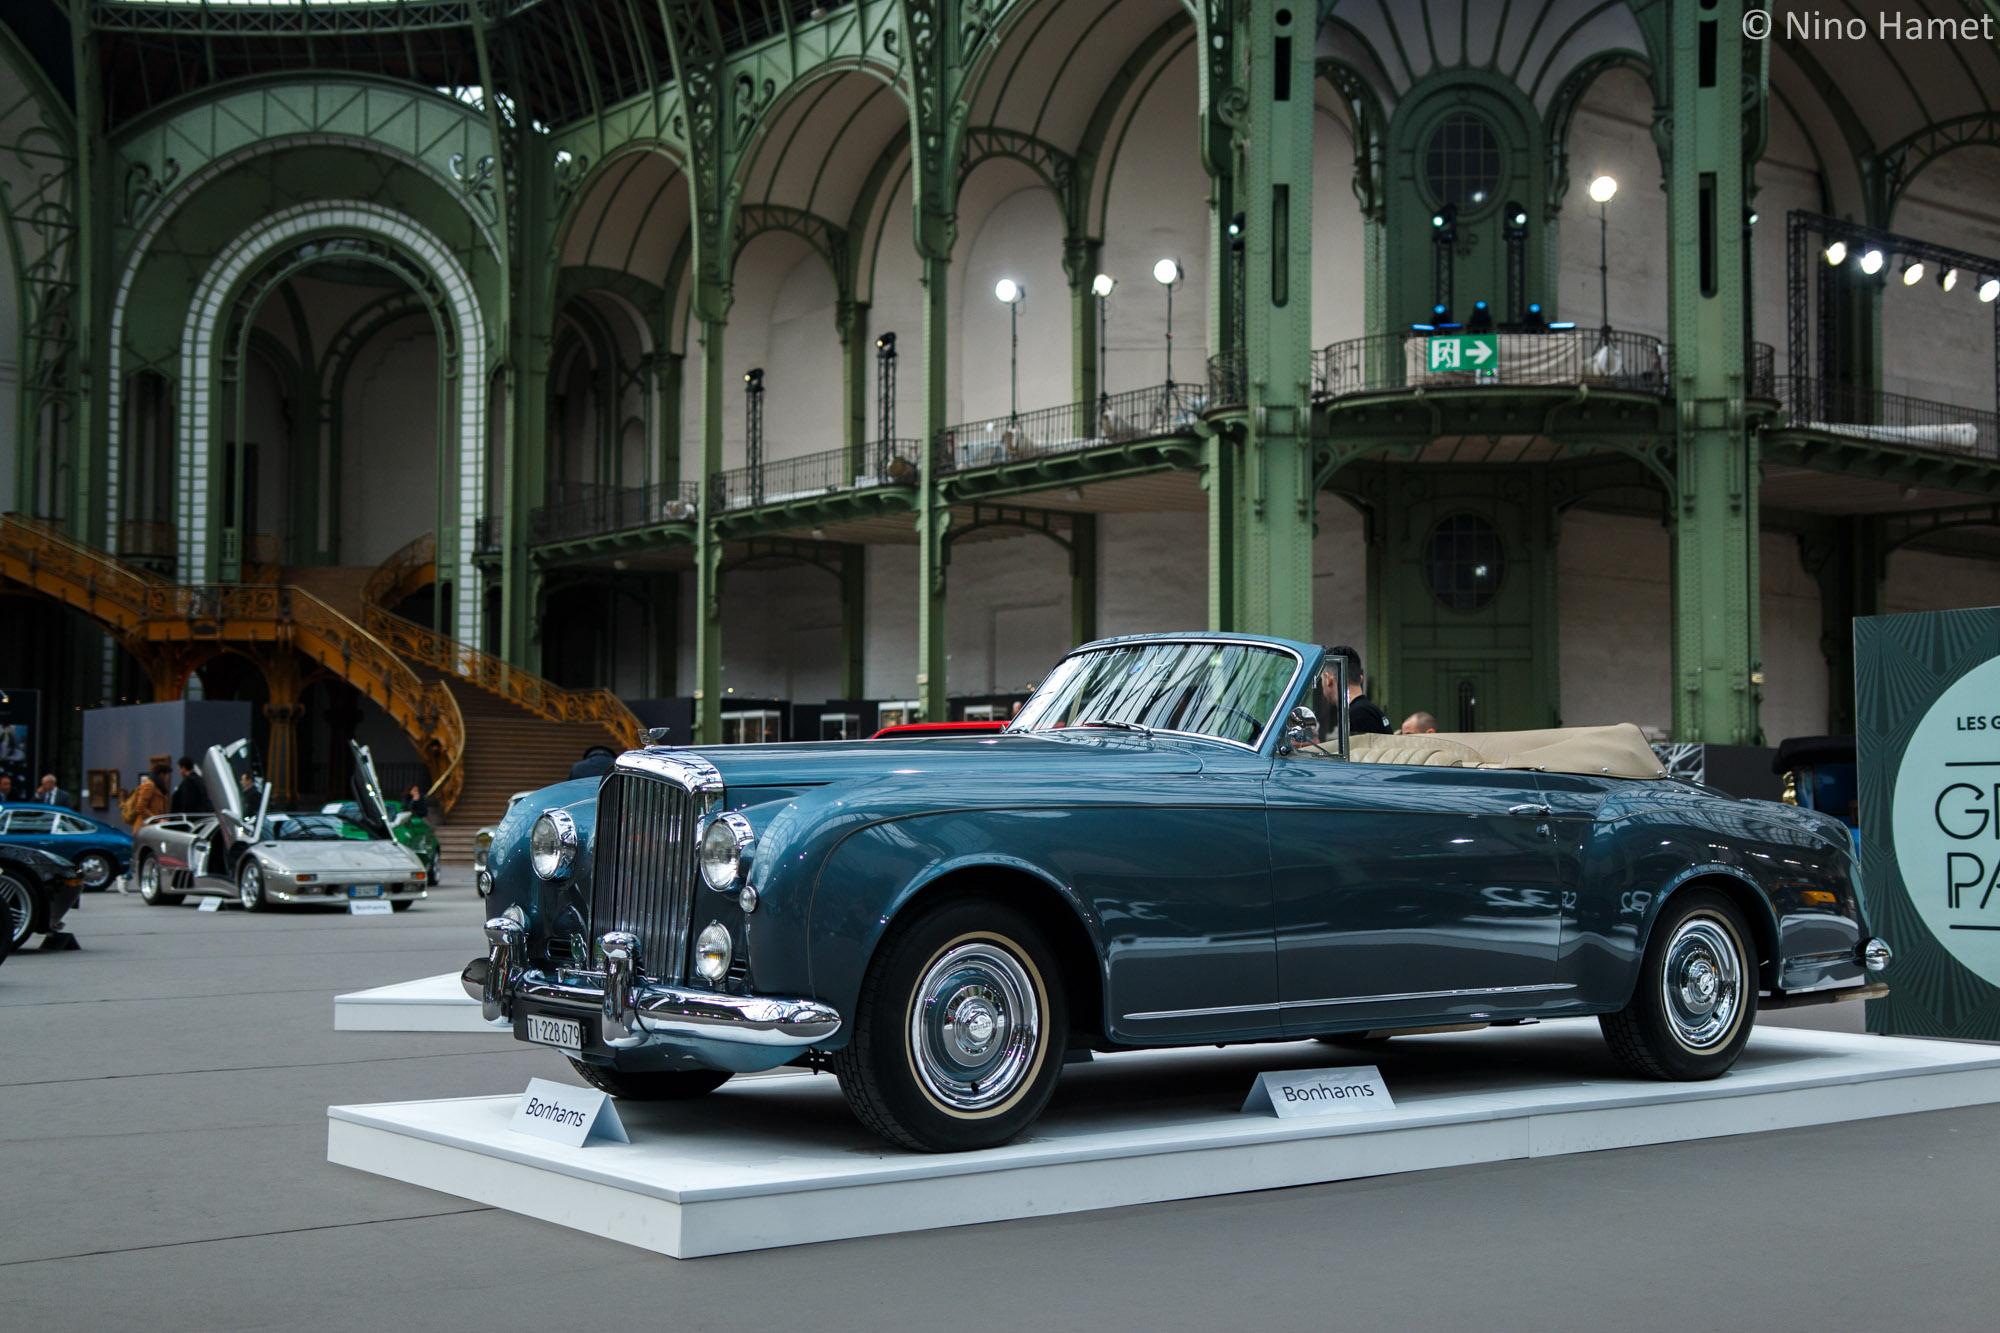 Une Bentley Continental S1 Cabriolet de 1967, adjugée 930 000 euros.